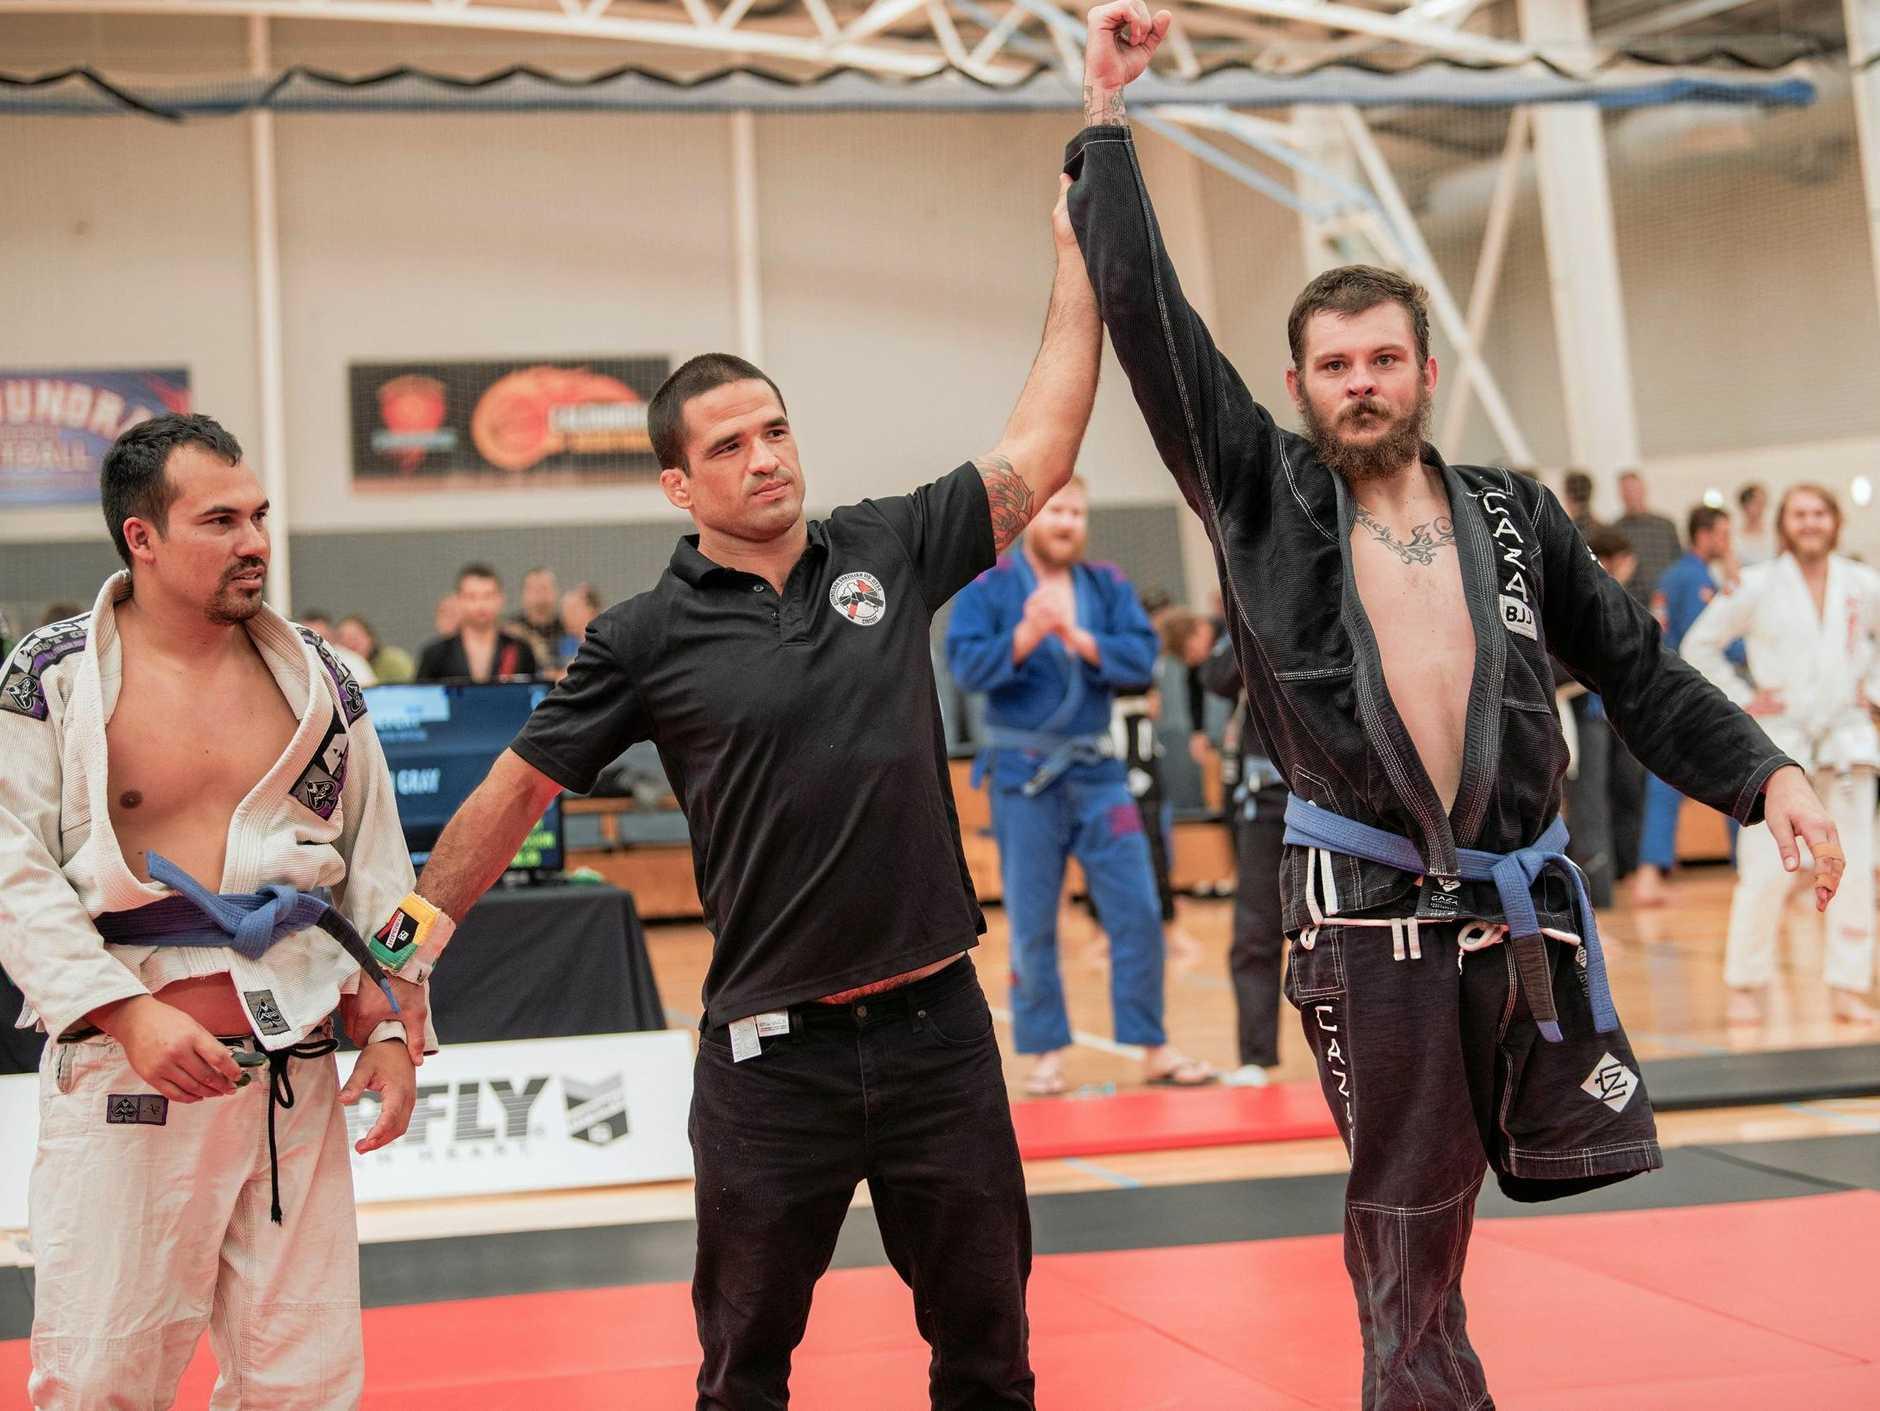 Tewantin's Jed Gray after winning the Medium Heavy Masters 1 Blue Belt division at the 2019 Sunshine Coast Brazilian Jiu-Jitsu Championship.